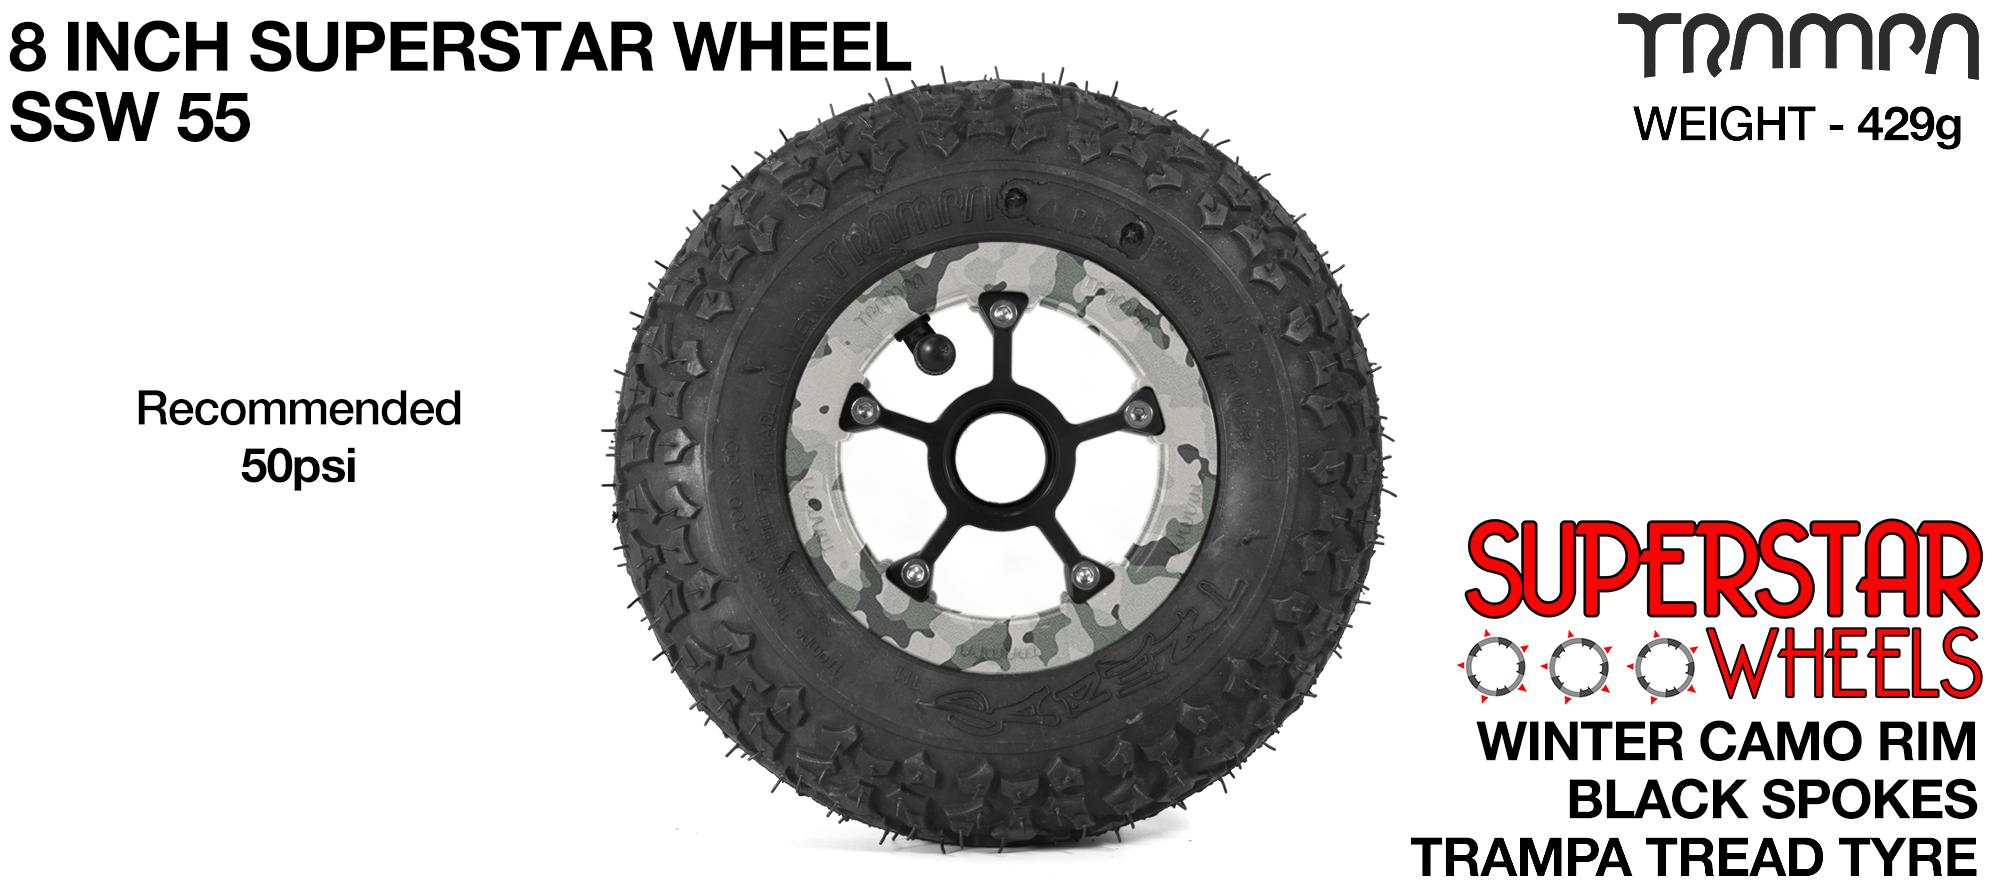 Superstar 8 inch wheel - Winter Camo Rim with Black Anodised spokes & TRAMPA TREAD 8 Inch Tyres